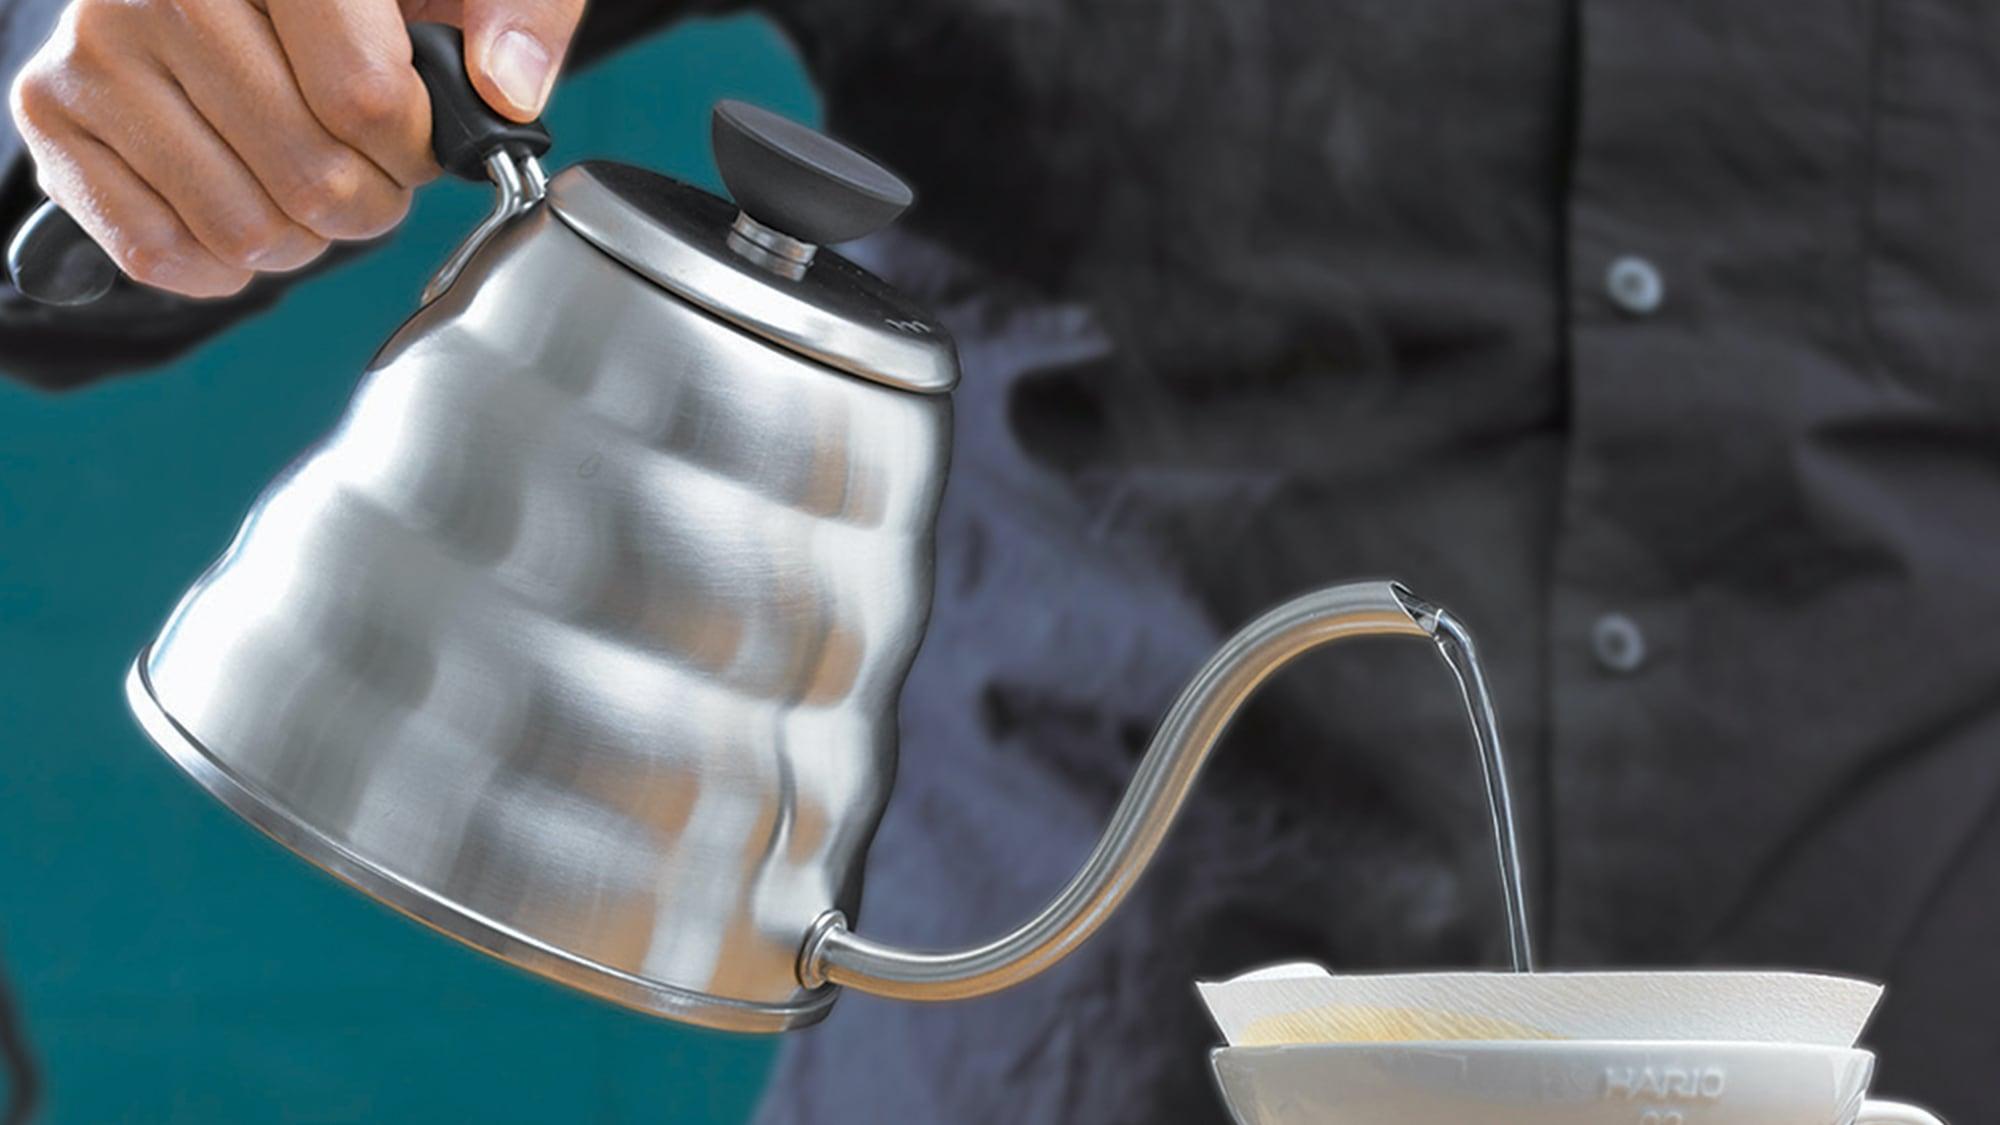 Hario V60 Buono Gooseneck Water Kettle